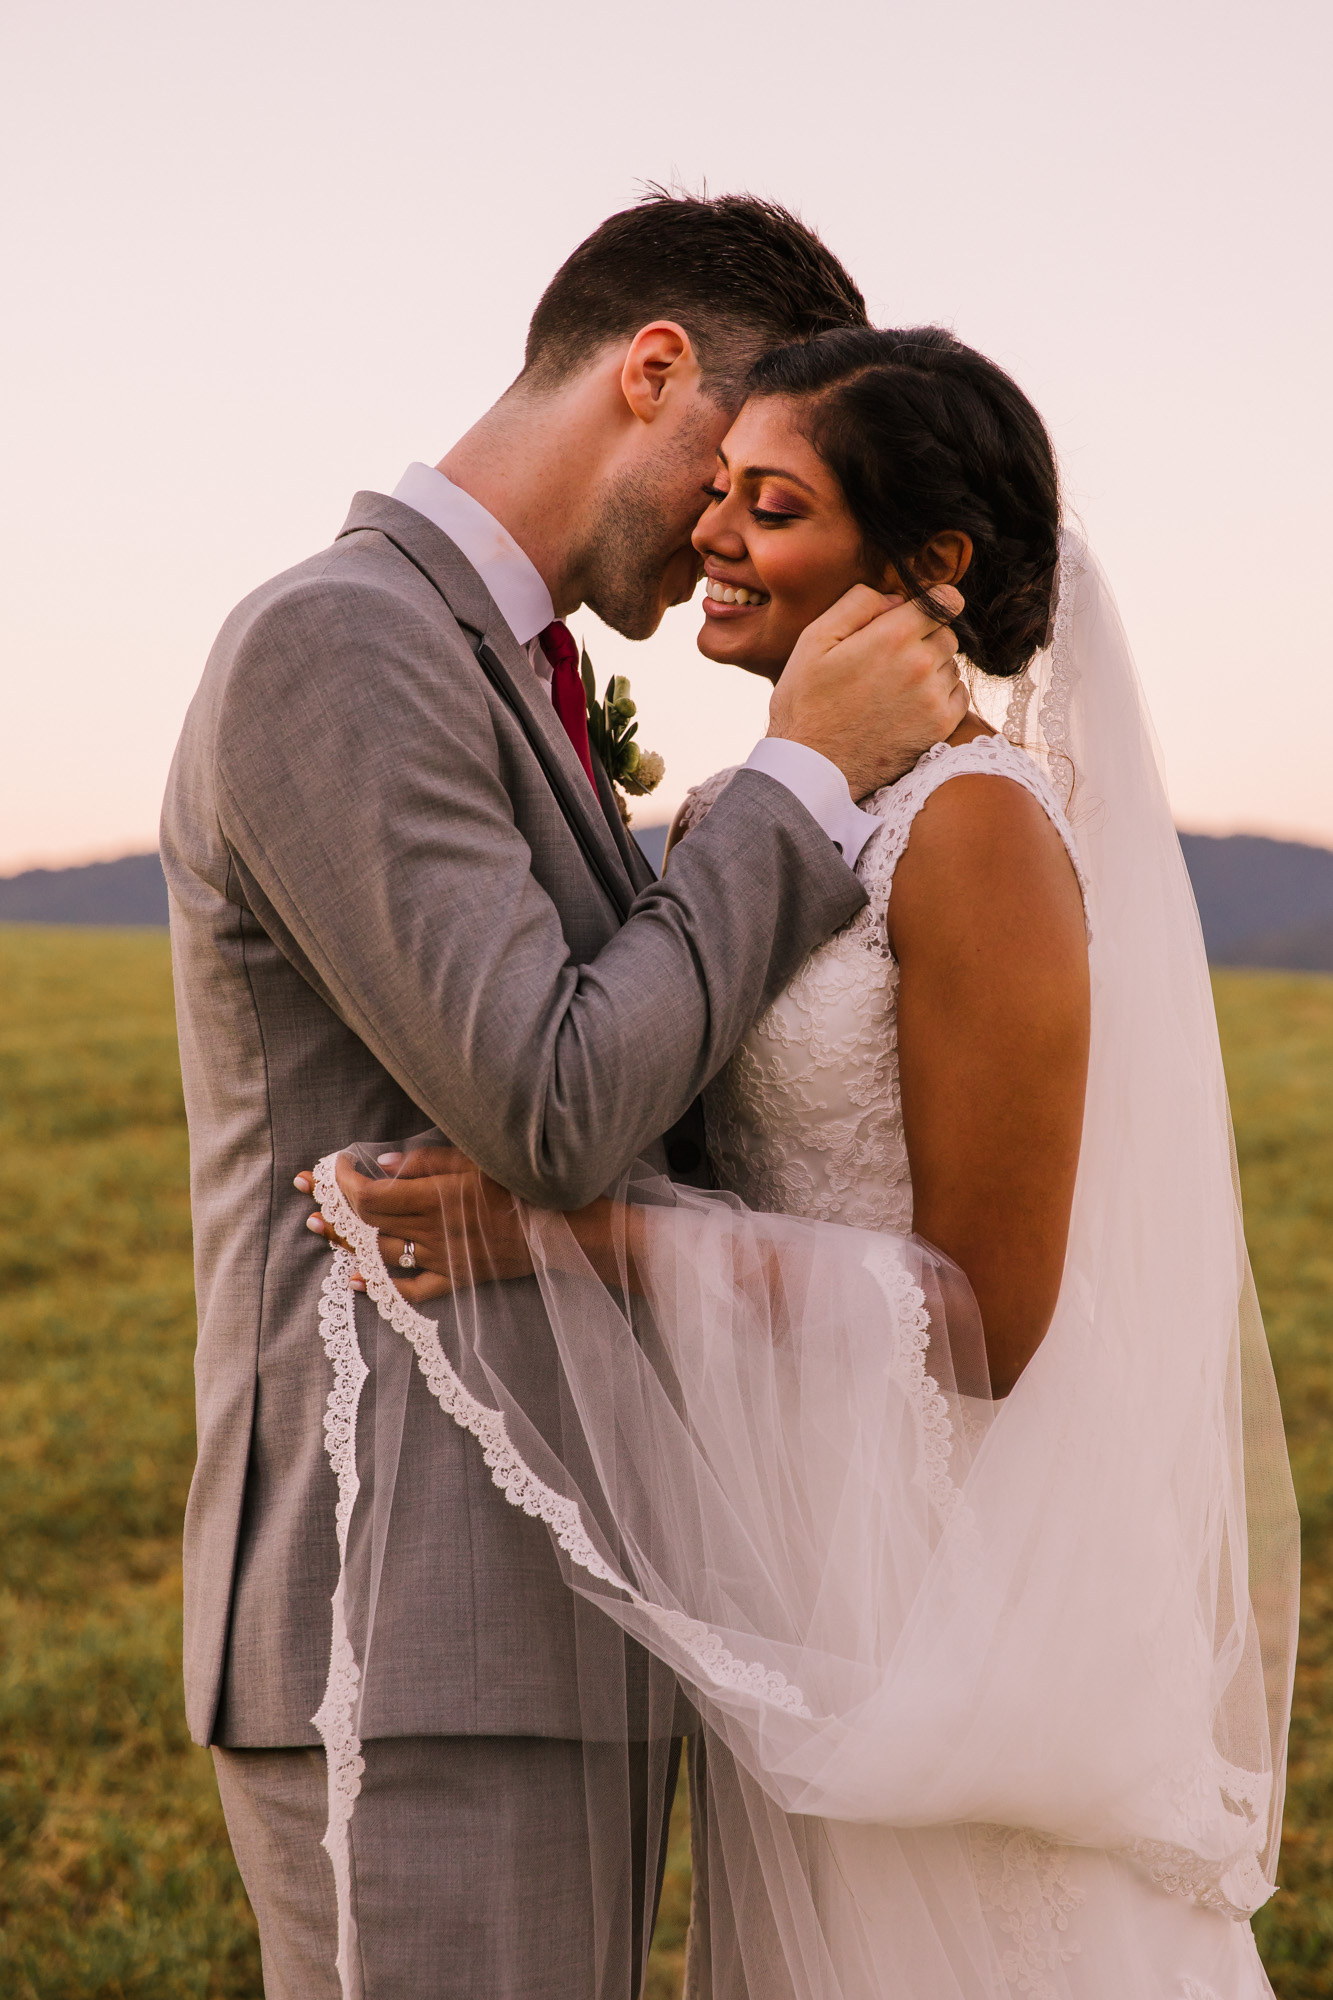 Waynesville NC Wedding Photography | Groom Whispers in Bride's Ear